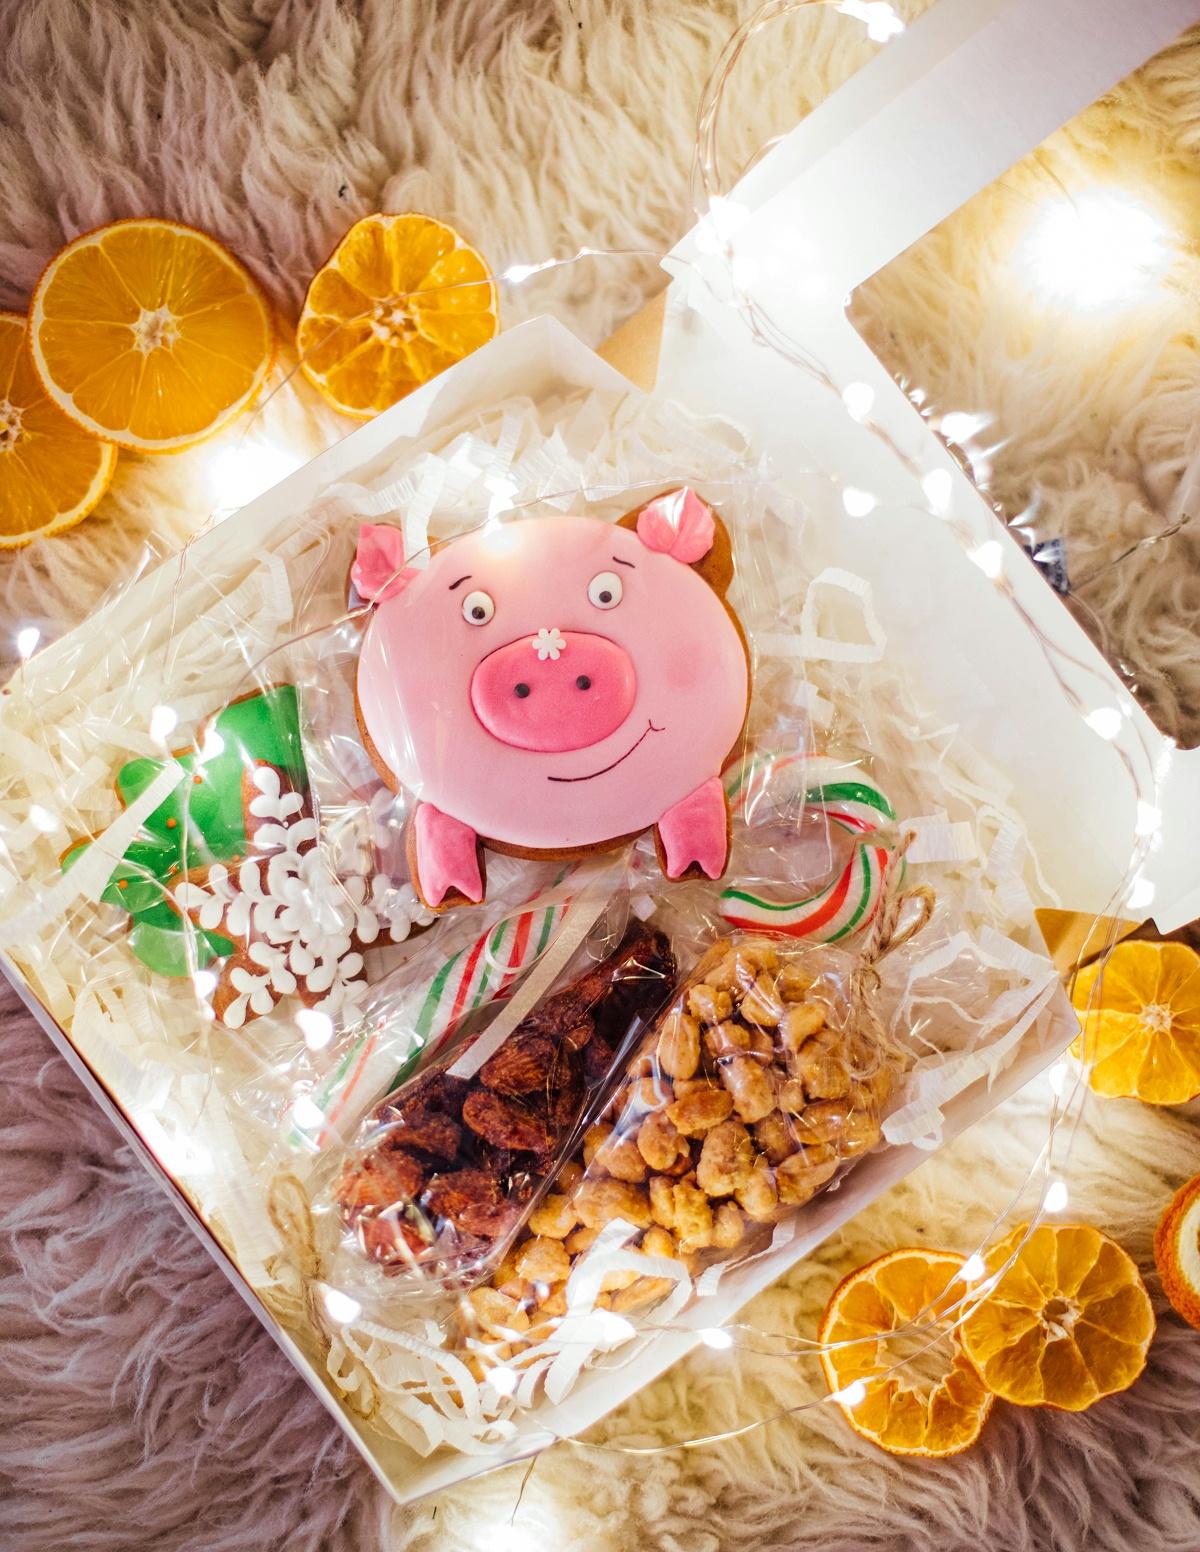 food-packs-near-sliced-orange-fruits-1718199